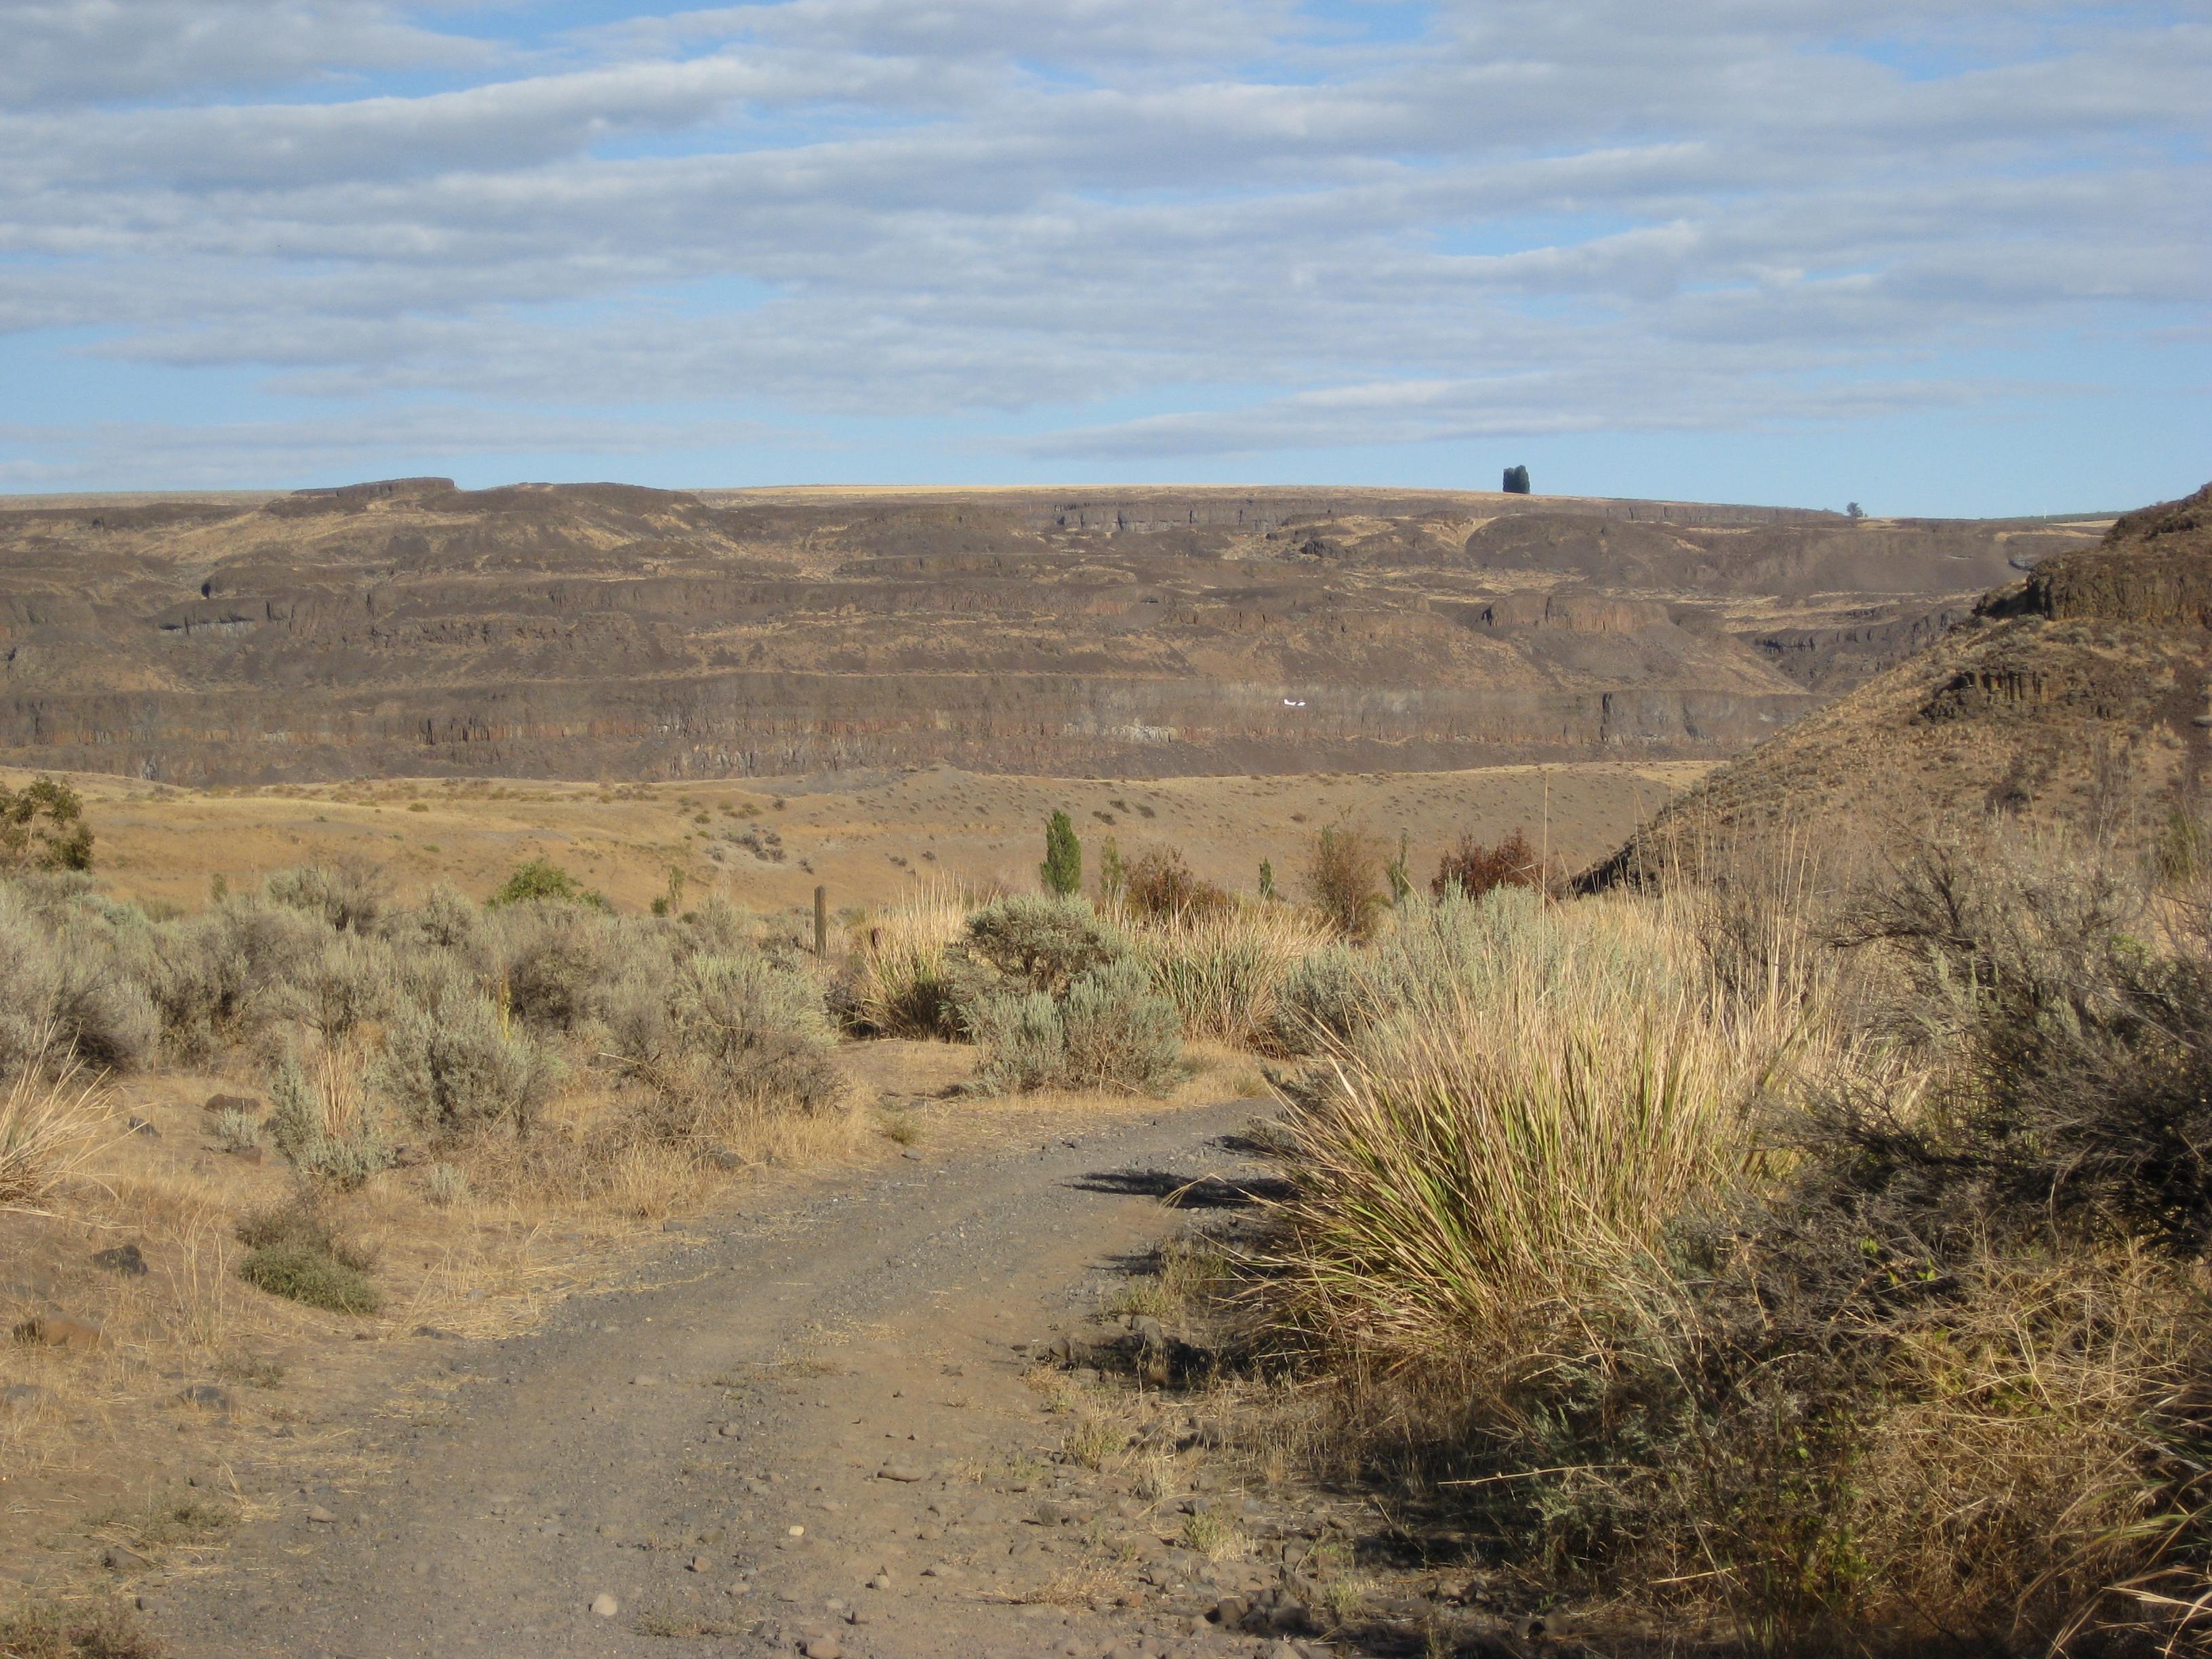 File:Desert like conditions of Eastern Washington.jpg